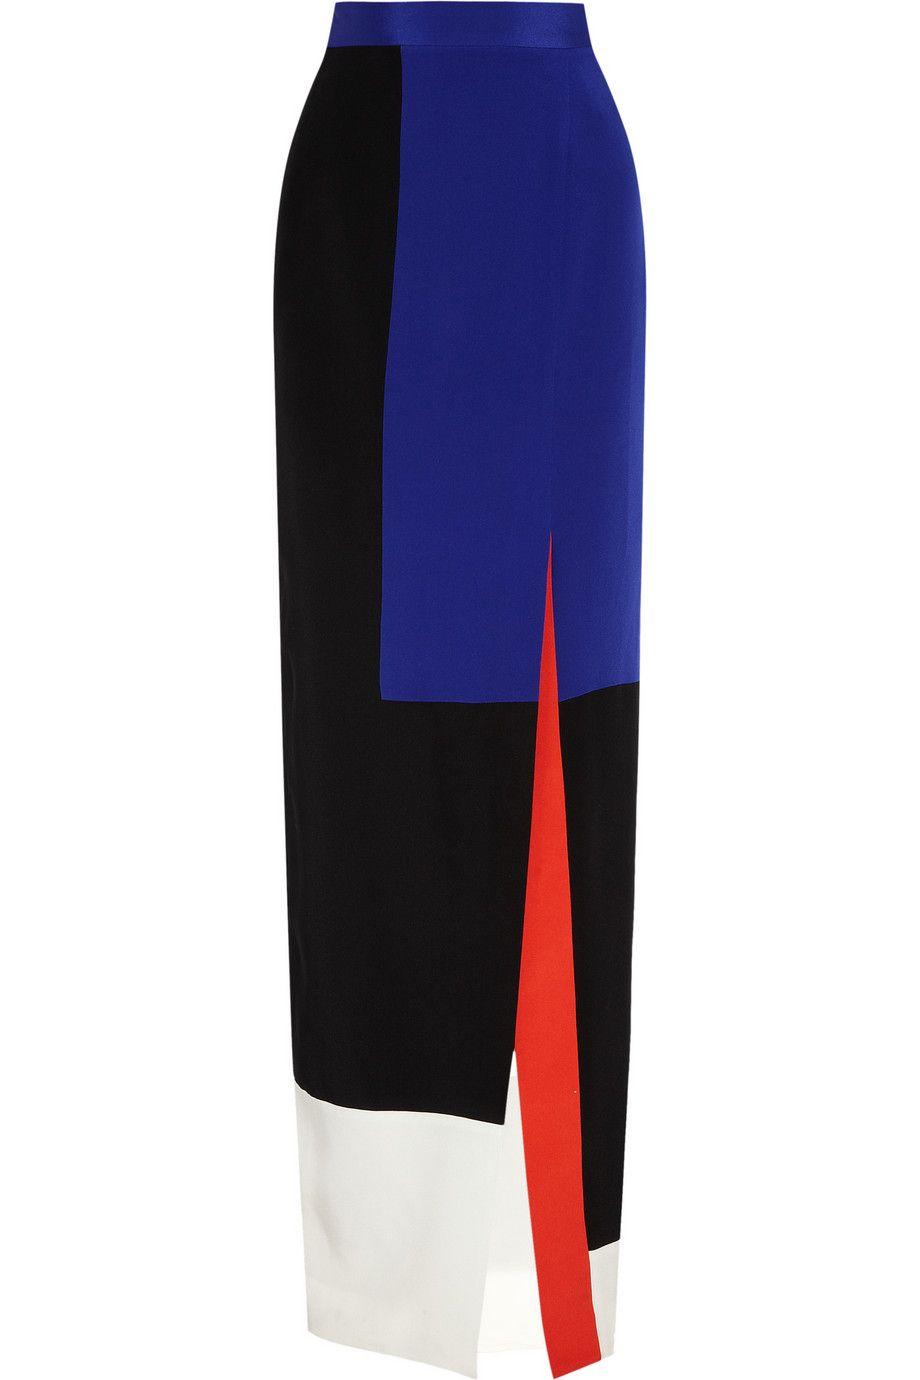 Roksanda Ilincic Color-block silk maxi skirt NET-A-PORTER.COM